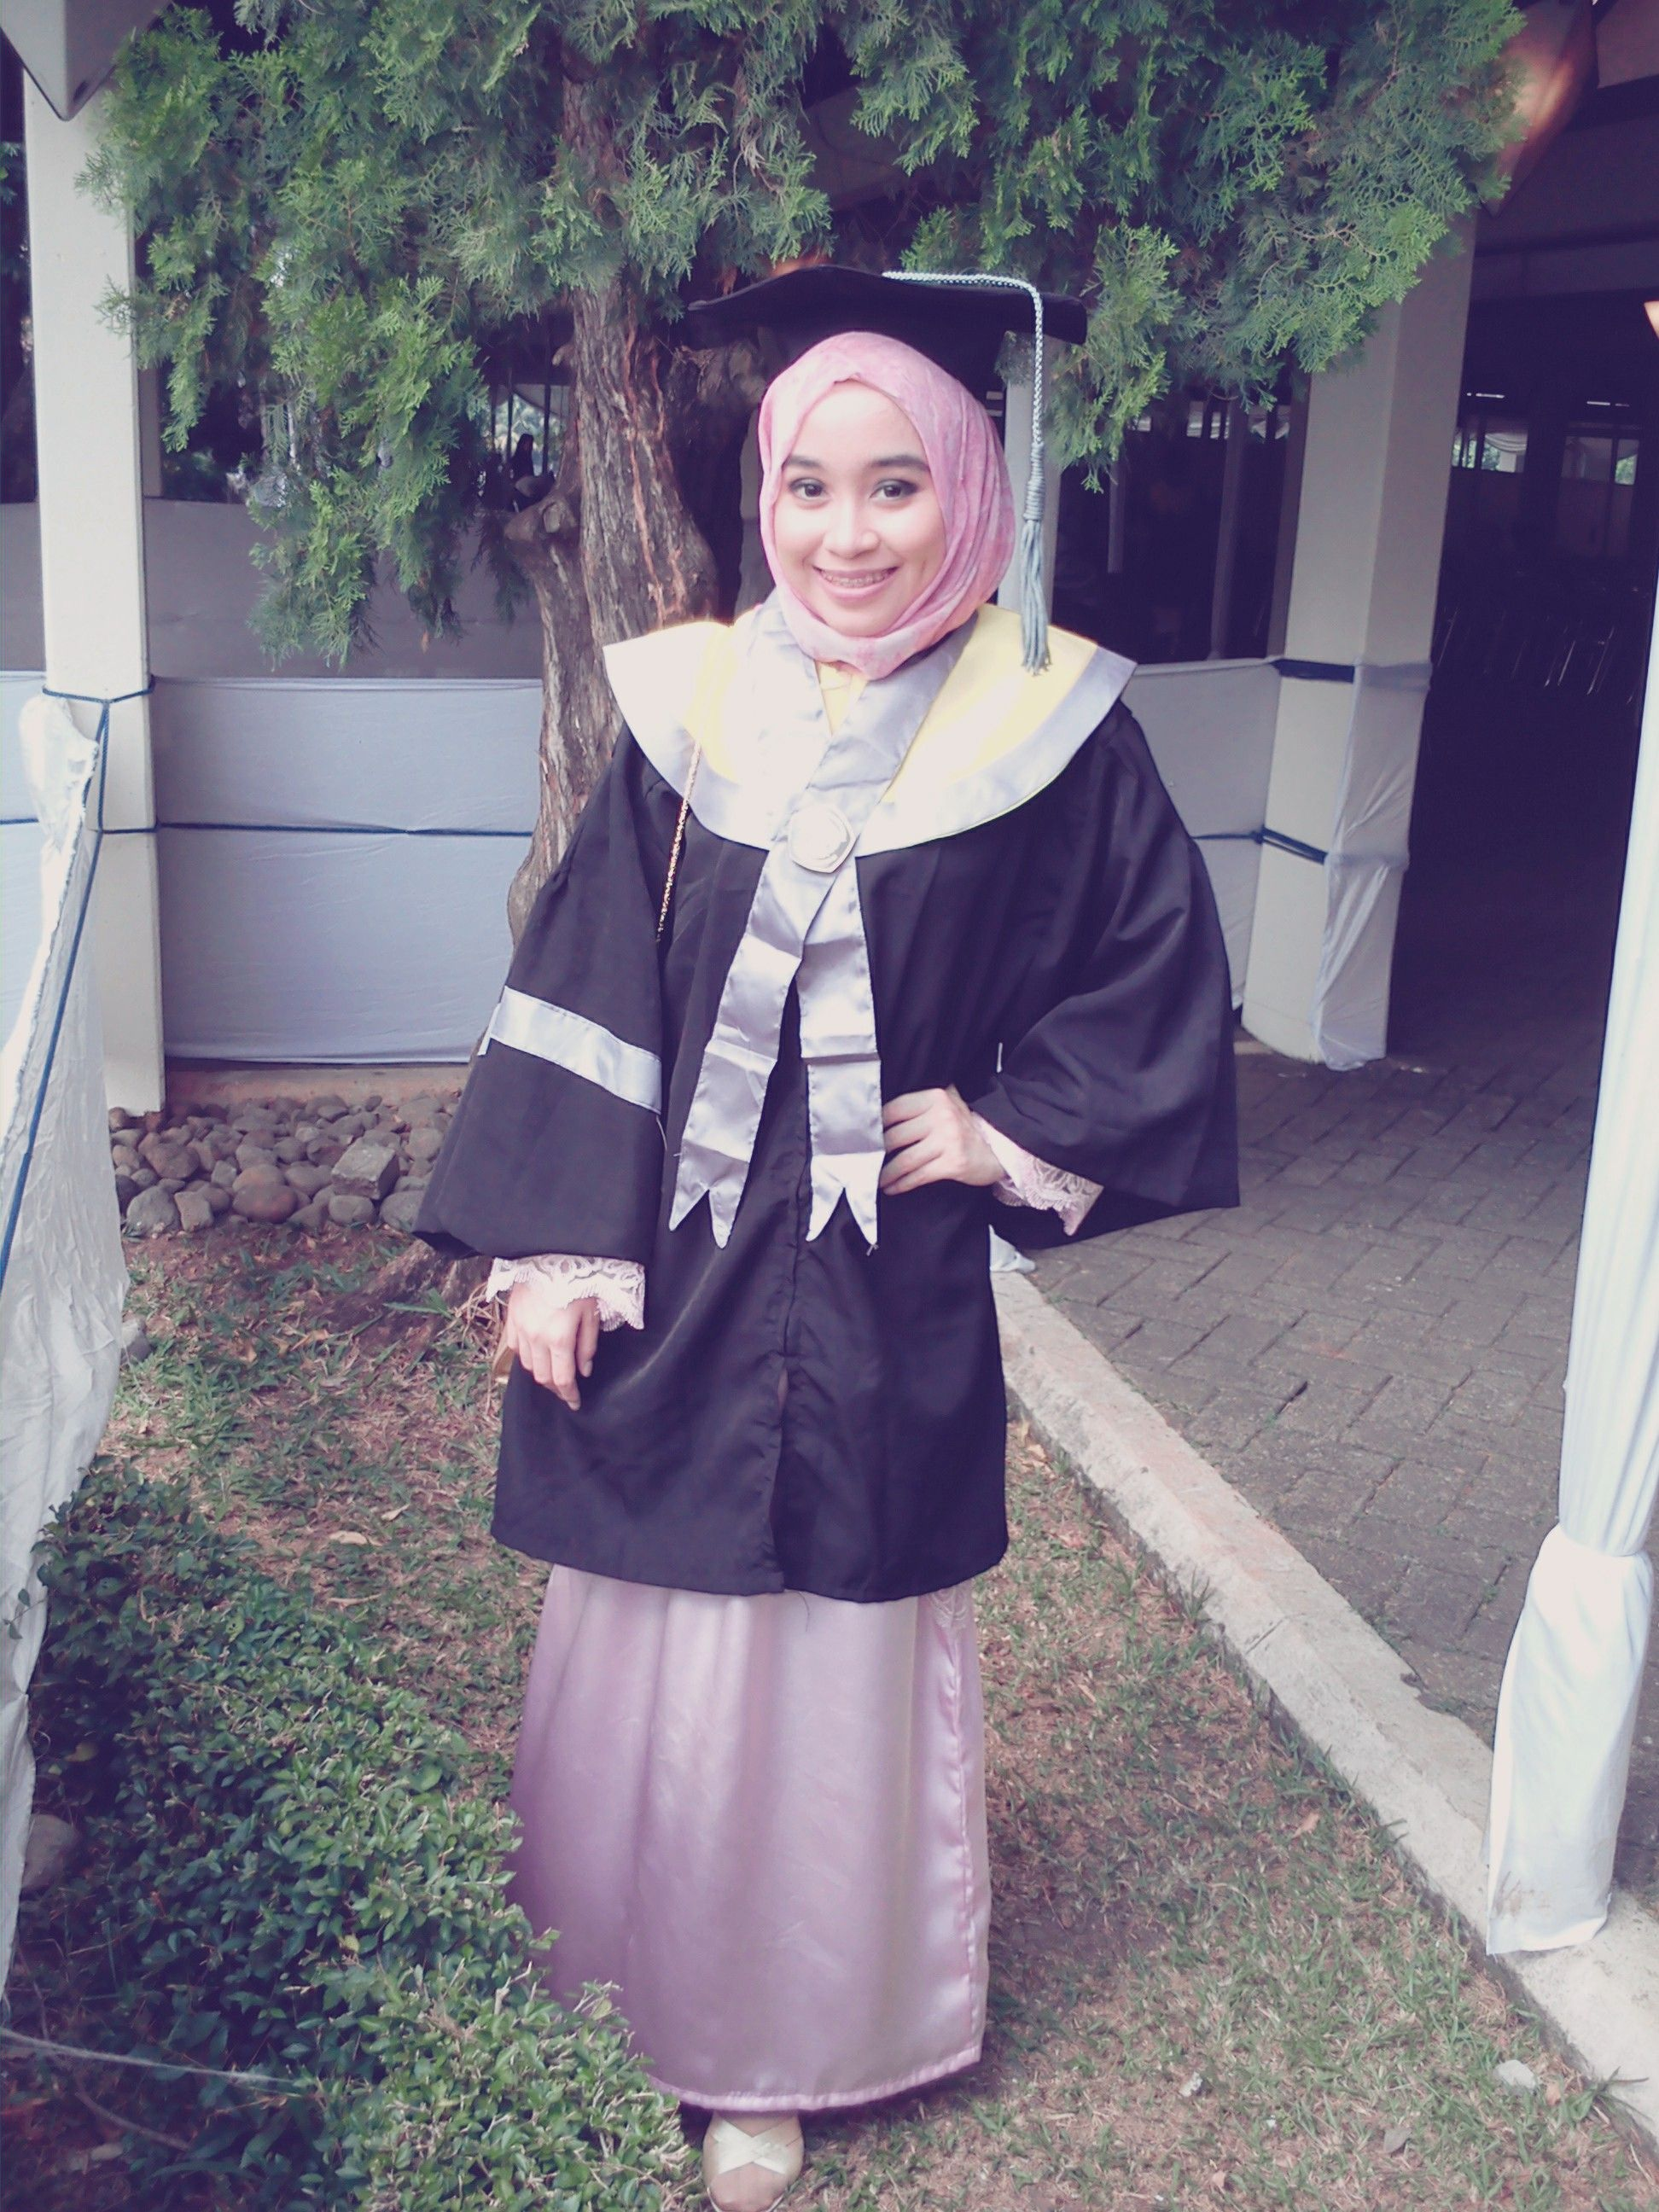 Graduation style in Hijab | Hijab and Muslim Fashion | Pinterest | Muslim fashion and Fashion